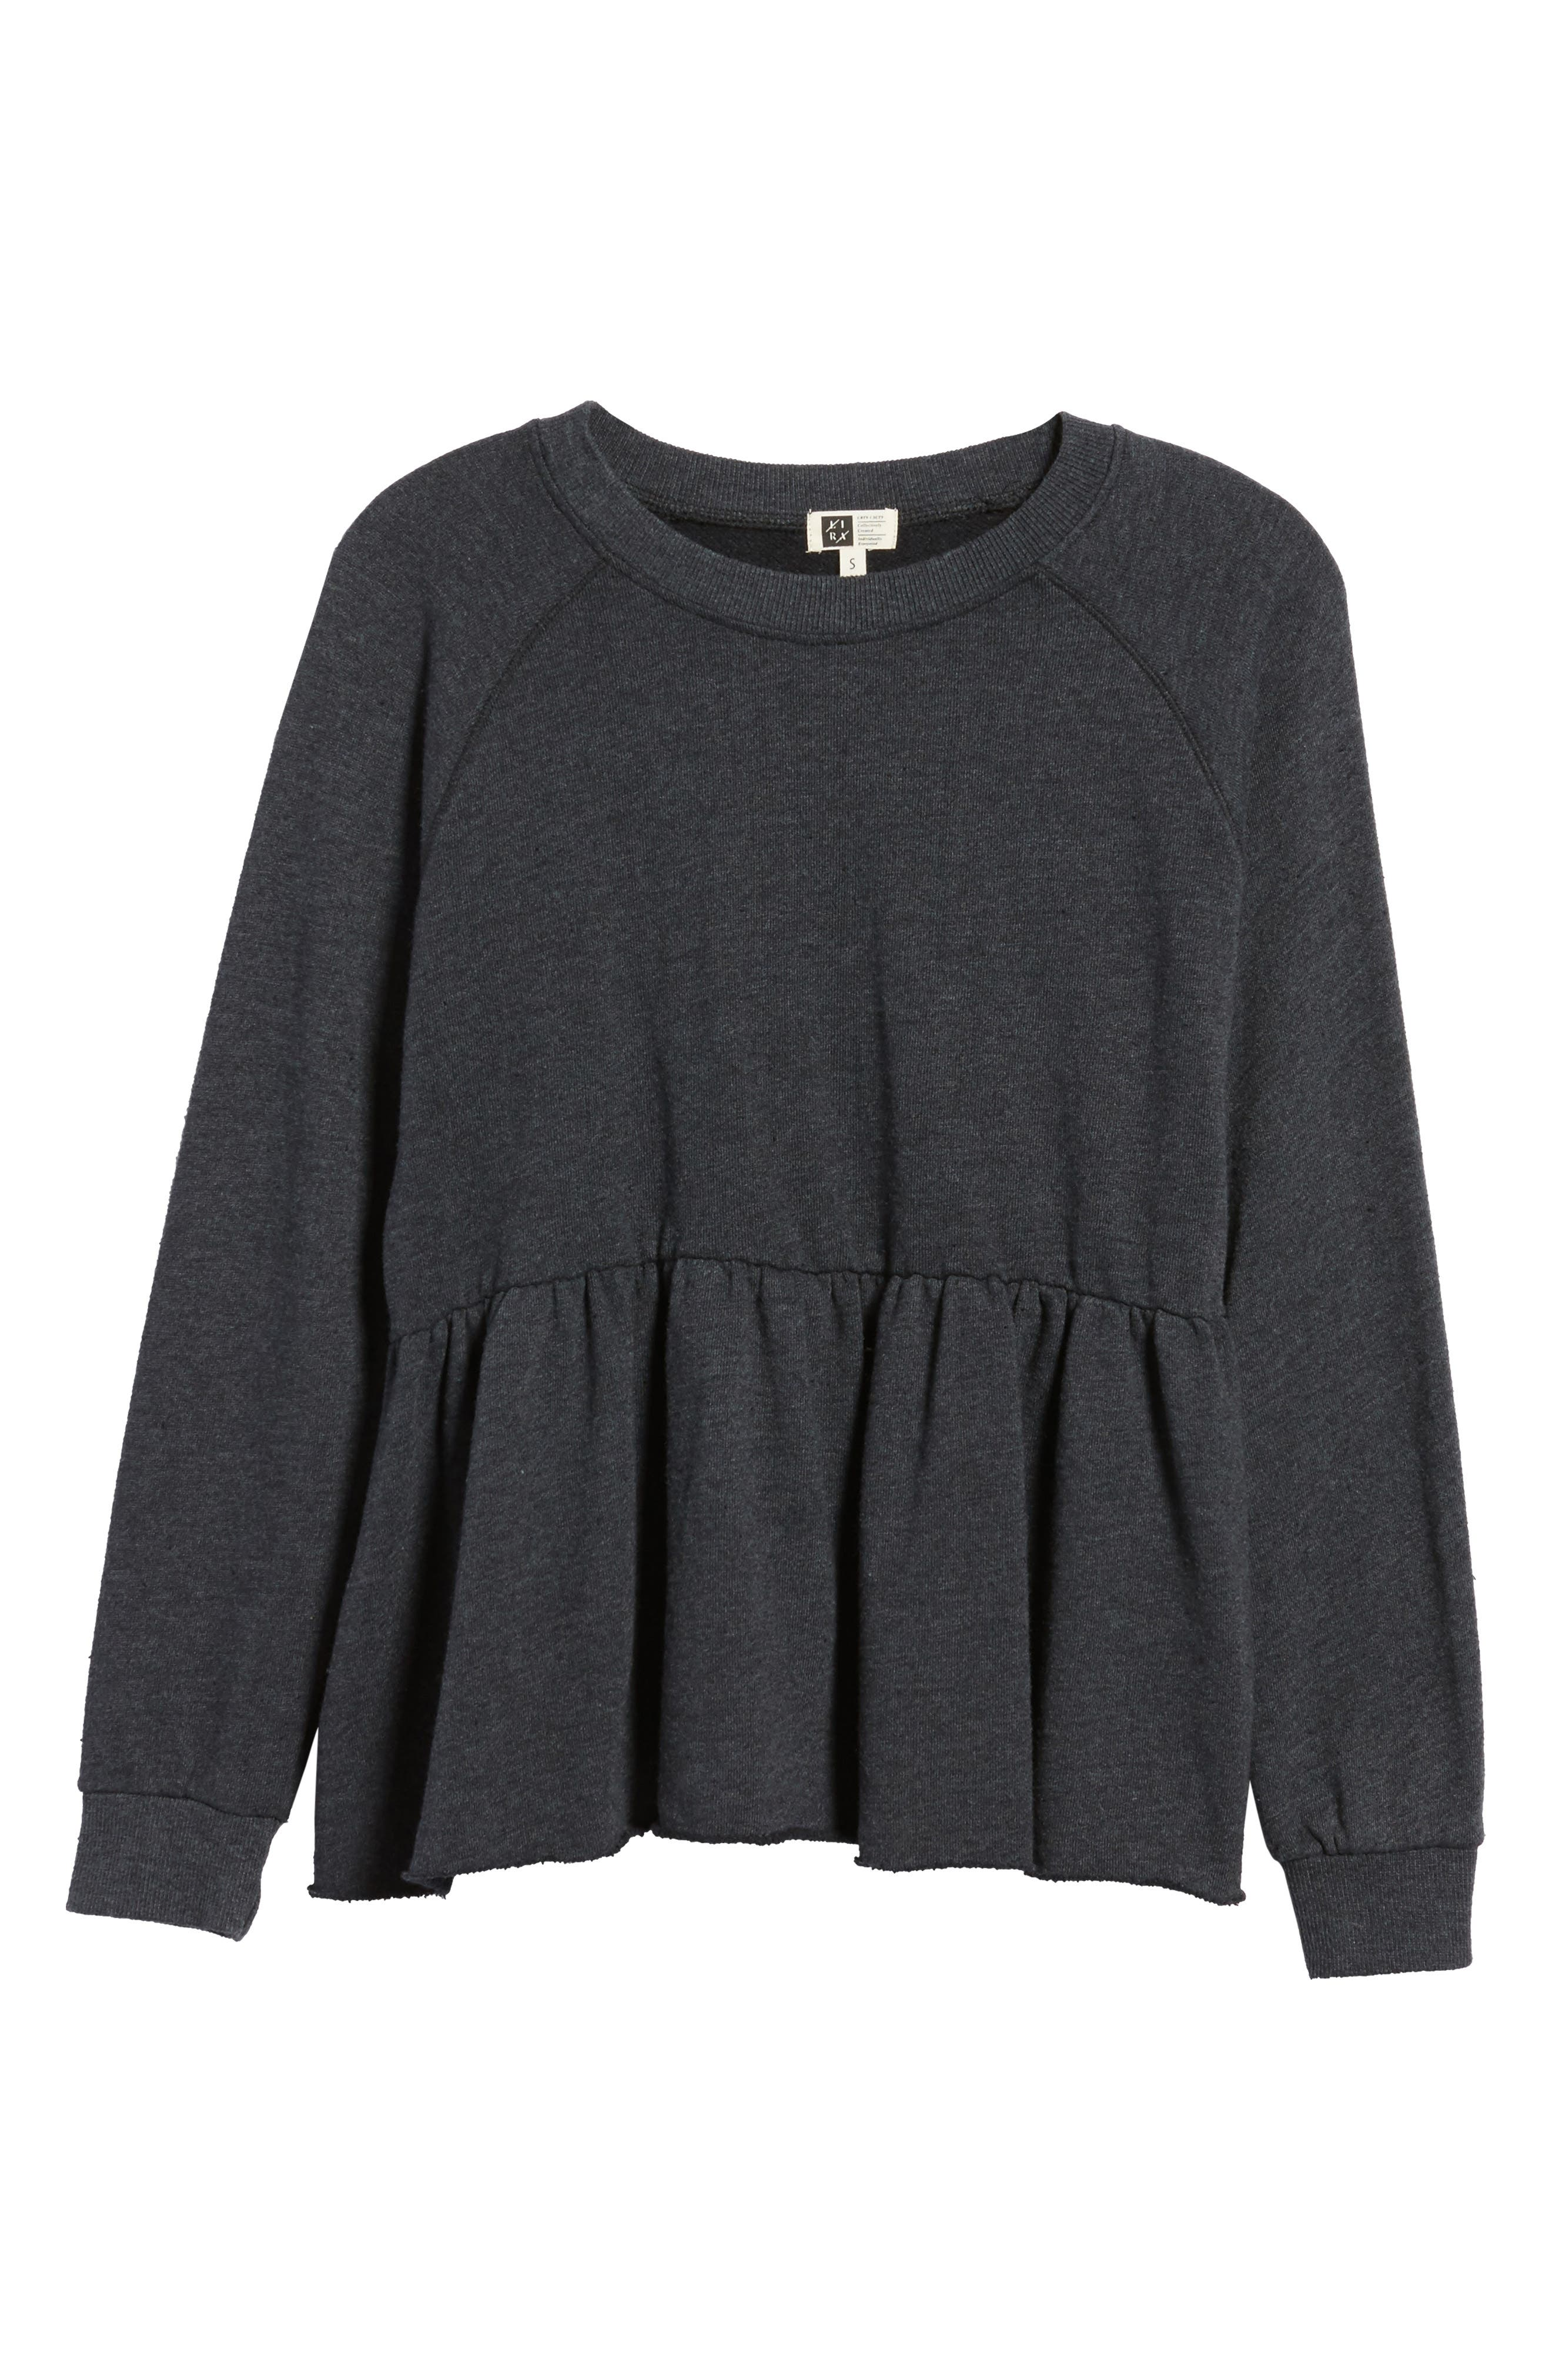 Viera Fleece Peplum Sweatshirt,                             Alternate thumbnail 6, color,                             020